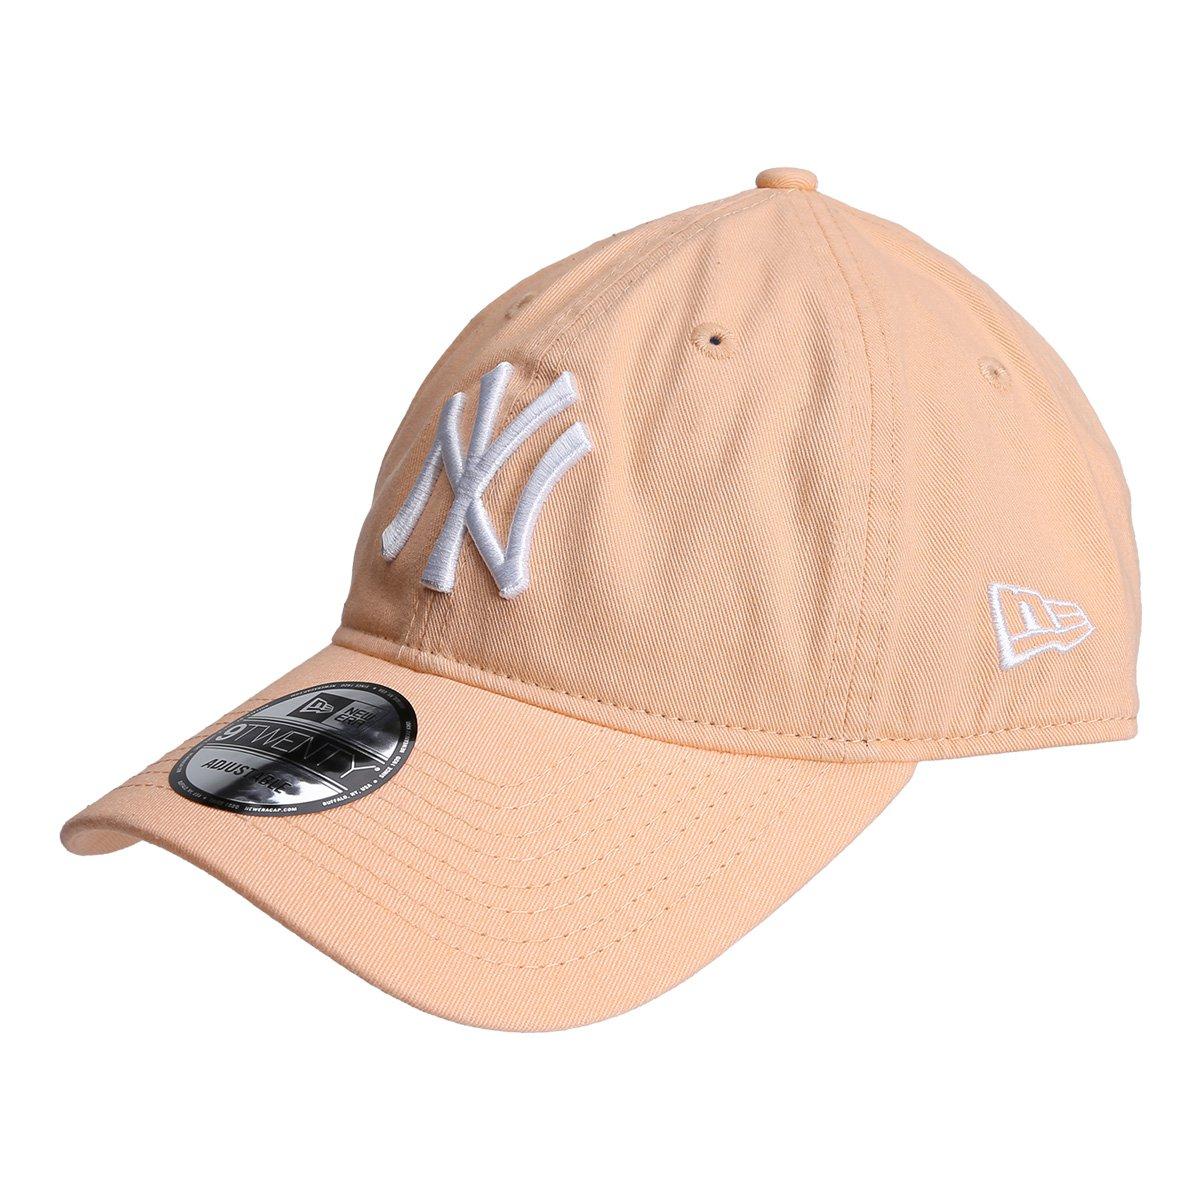 b8d68fde4 Boné New Era MLB New York Yankees Aba Curva 920 St Pastels - Compre Agora